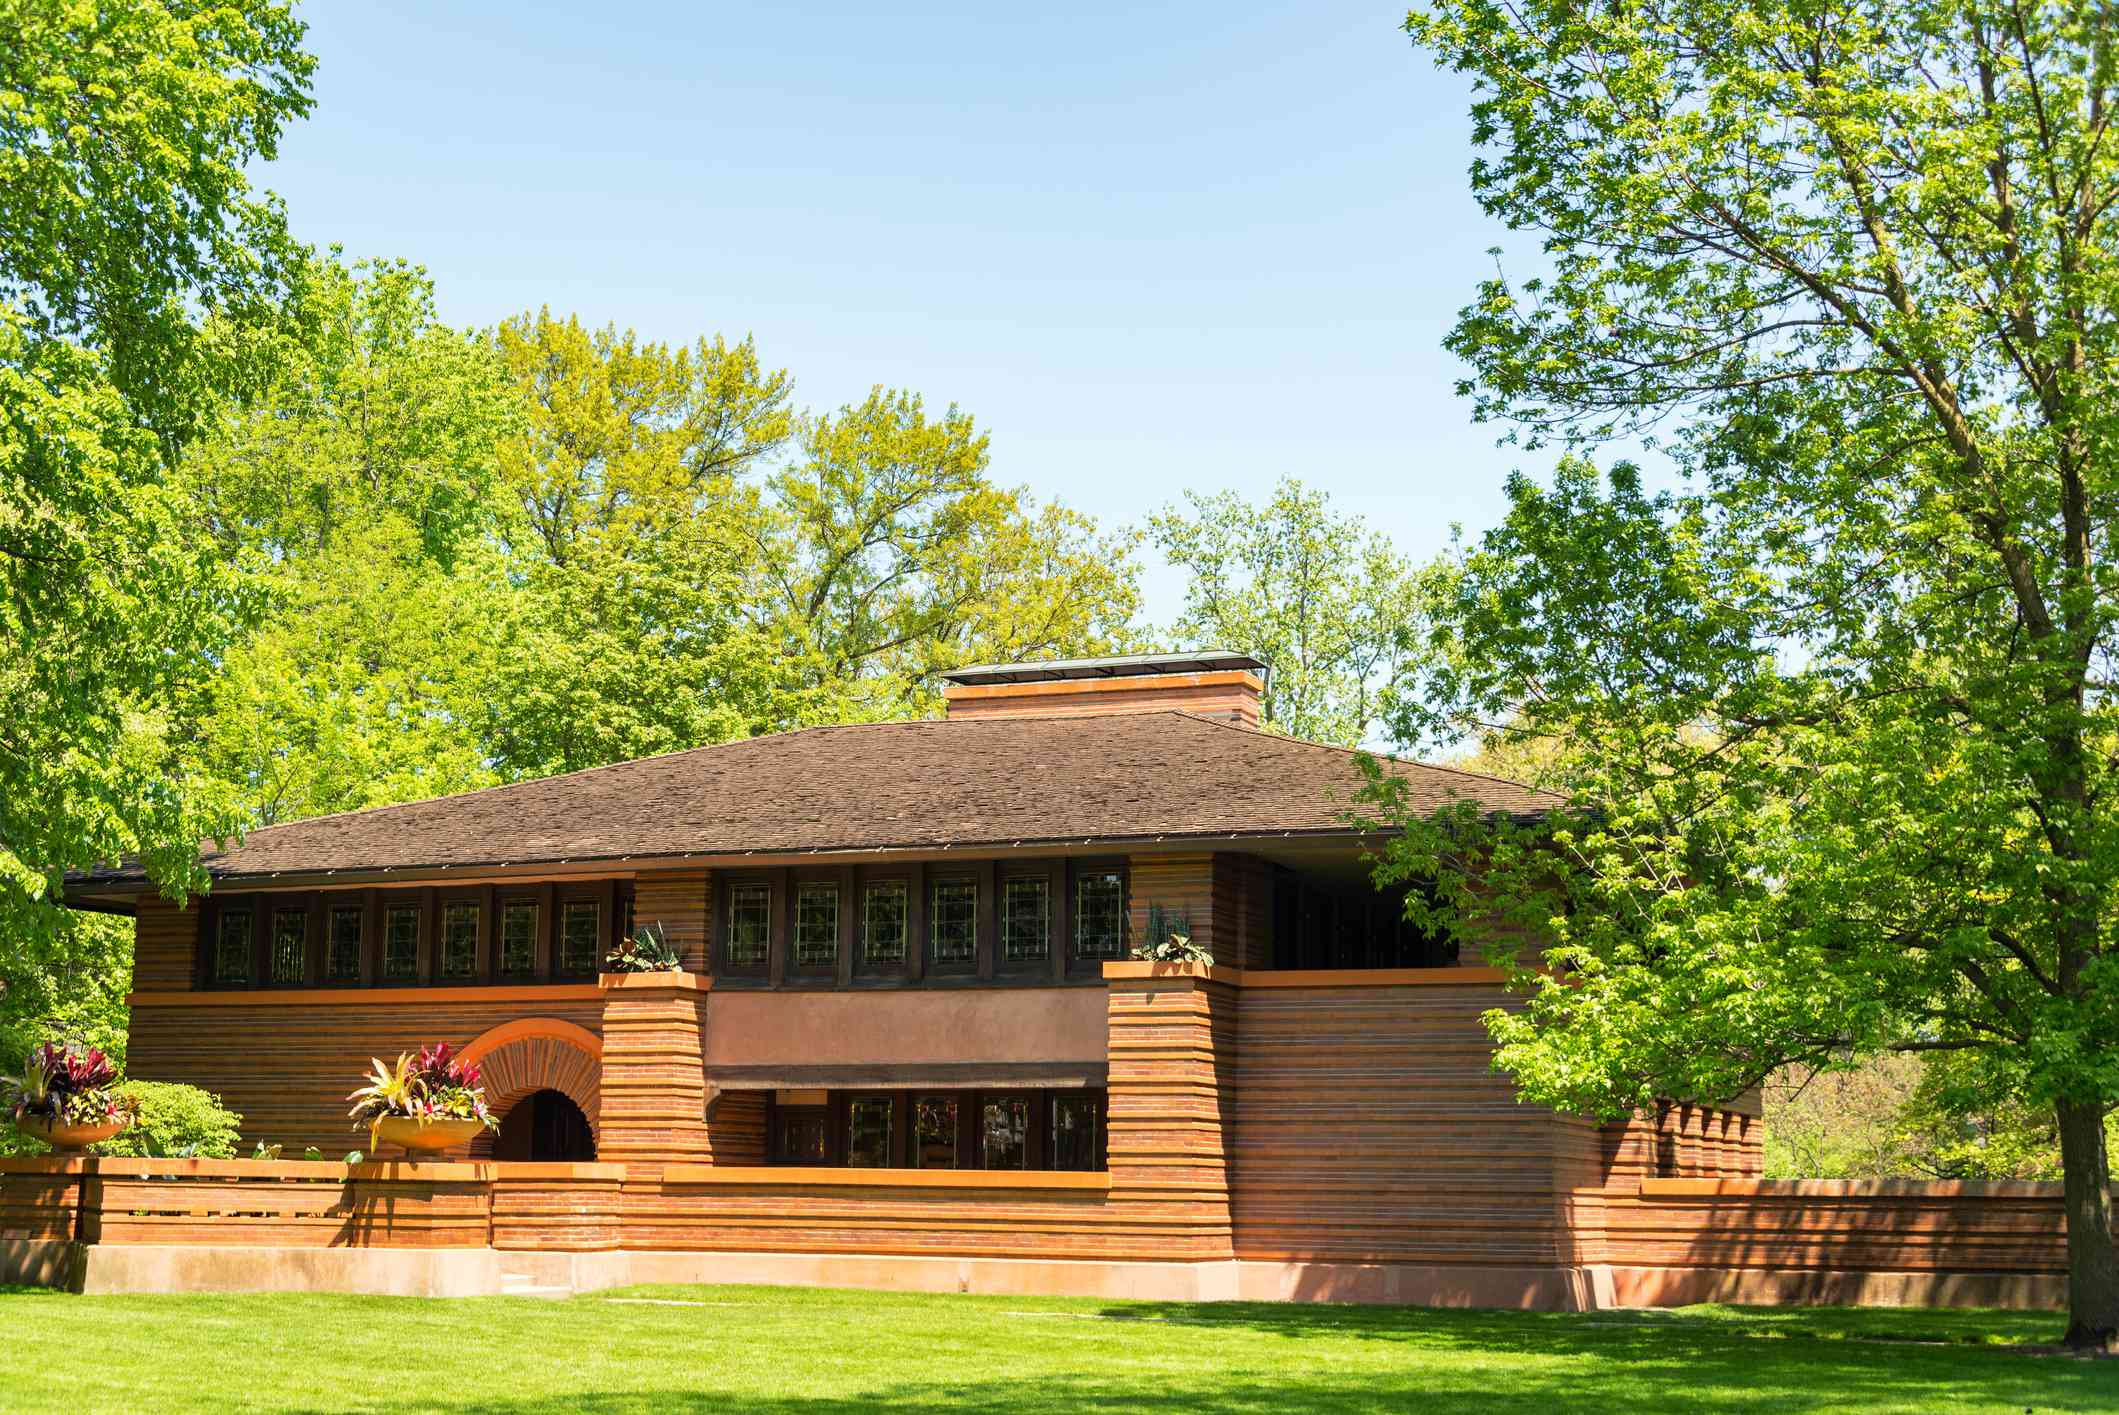 frank lloyd wright designer prairie style craftsman home